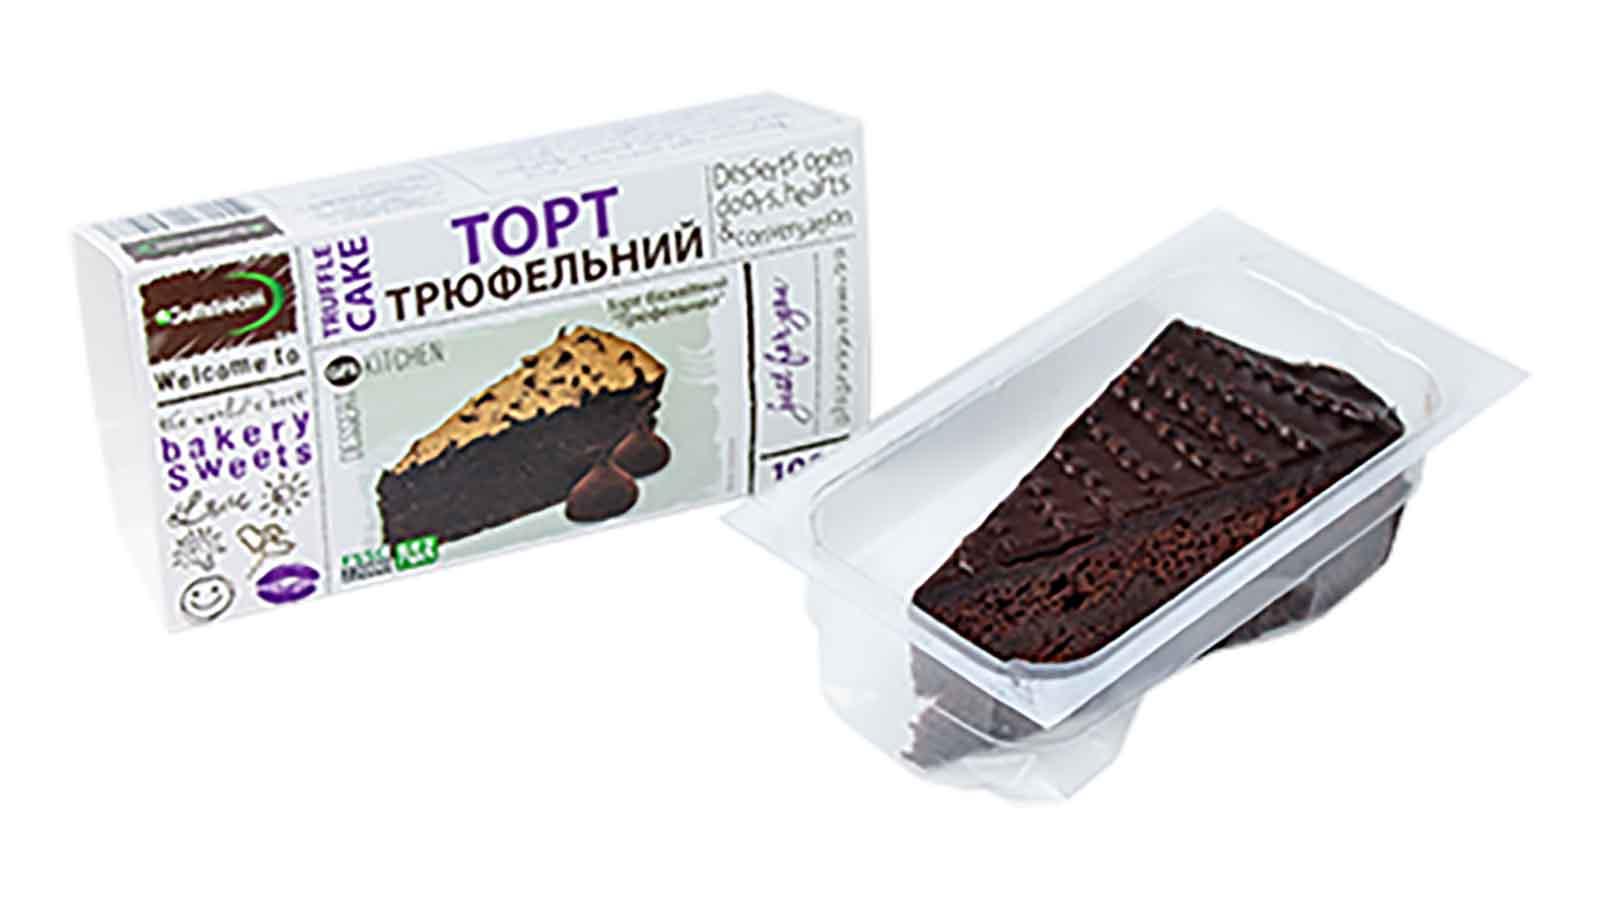 Truffle cake 100g